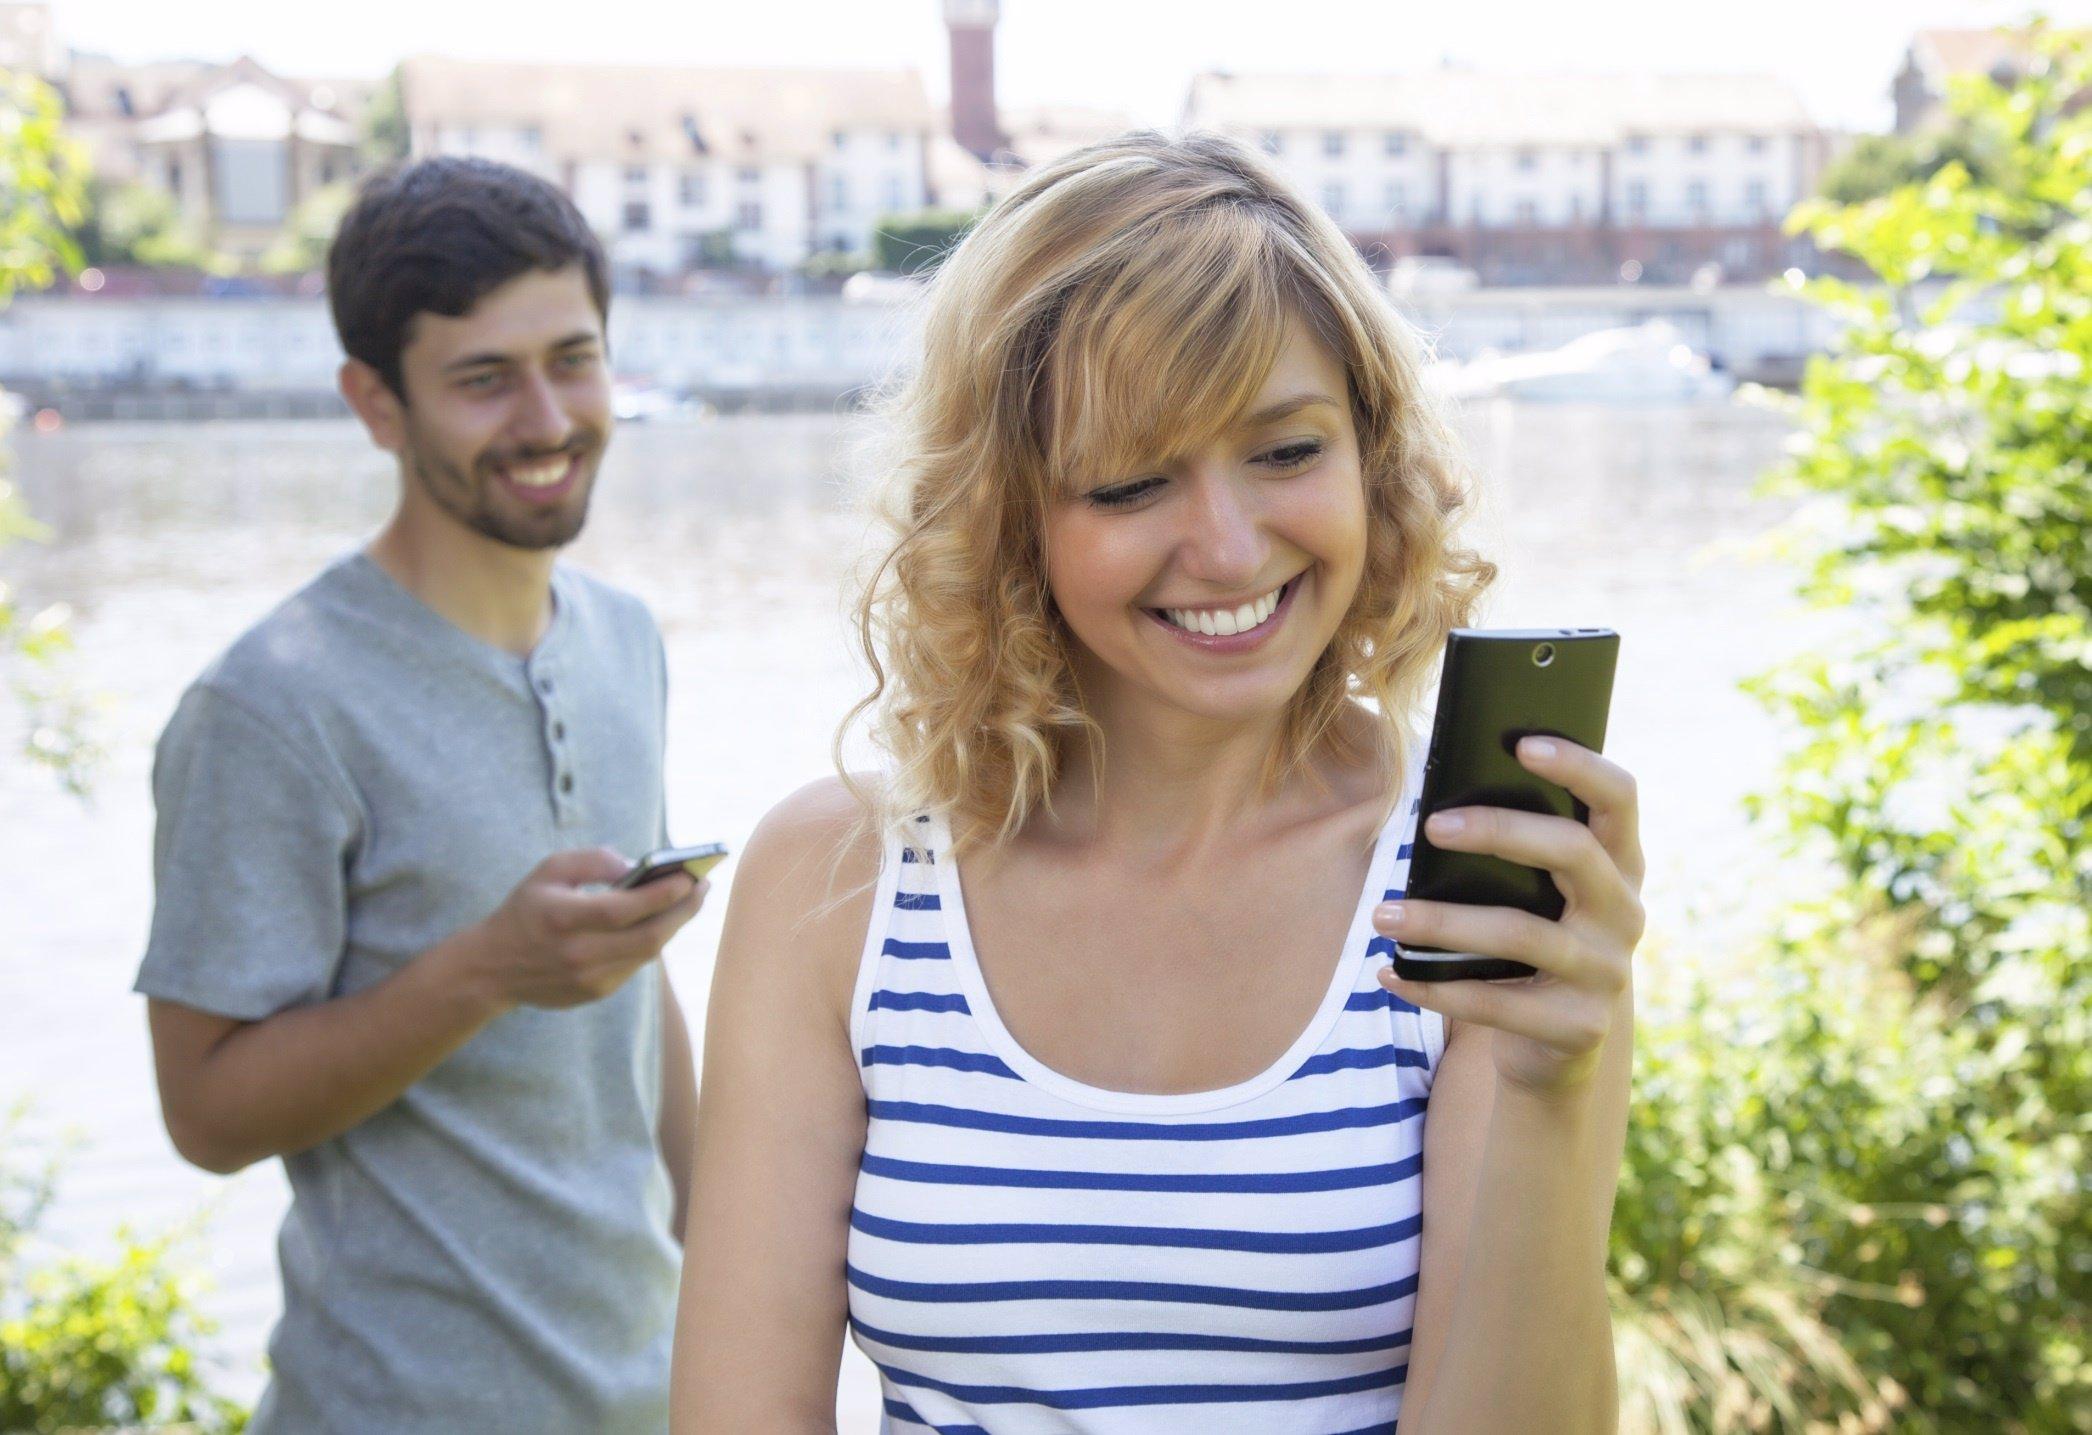 Pareja chateando, móvil, smartphone, WhatsApp y Line